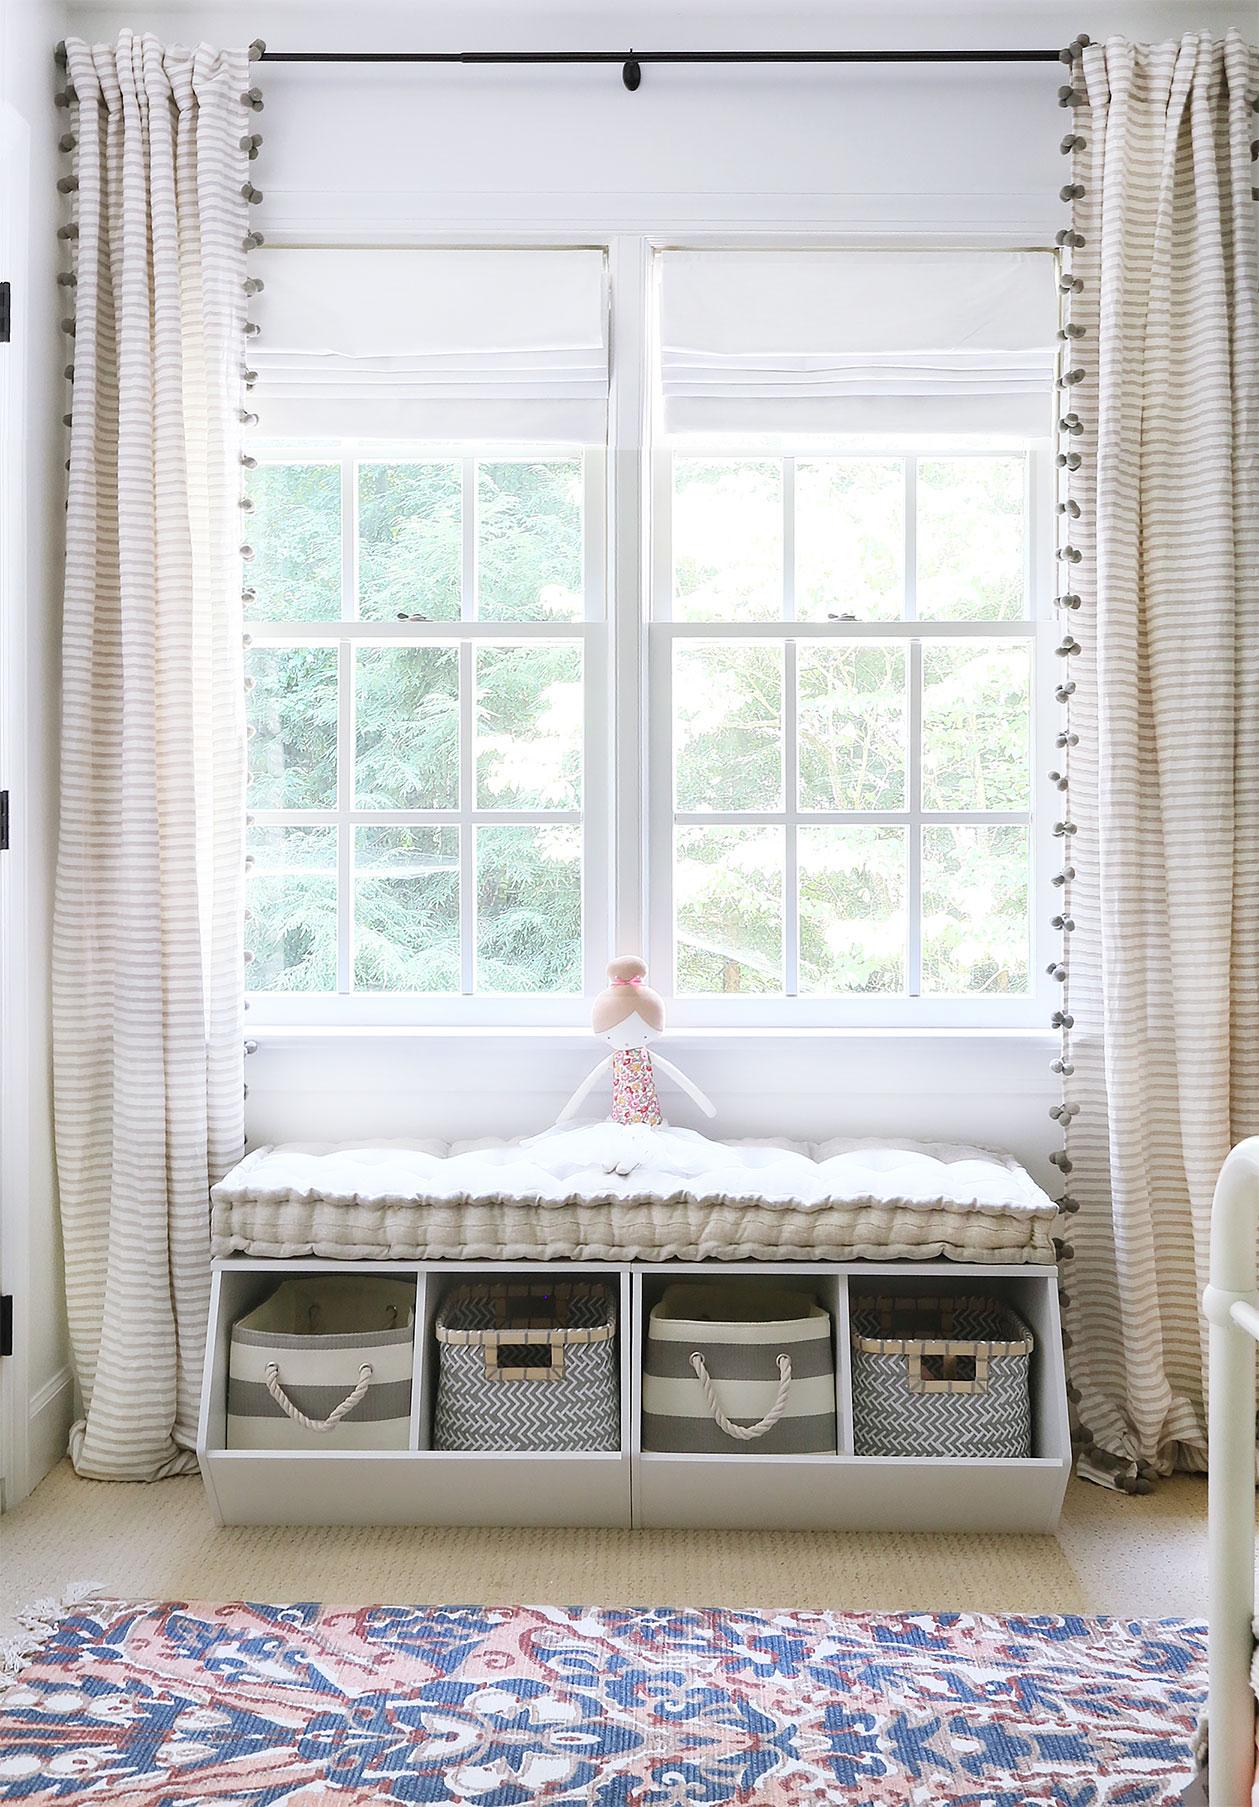 zora-bedroom-4-blog.jpg